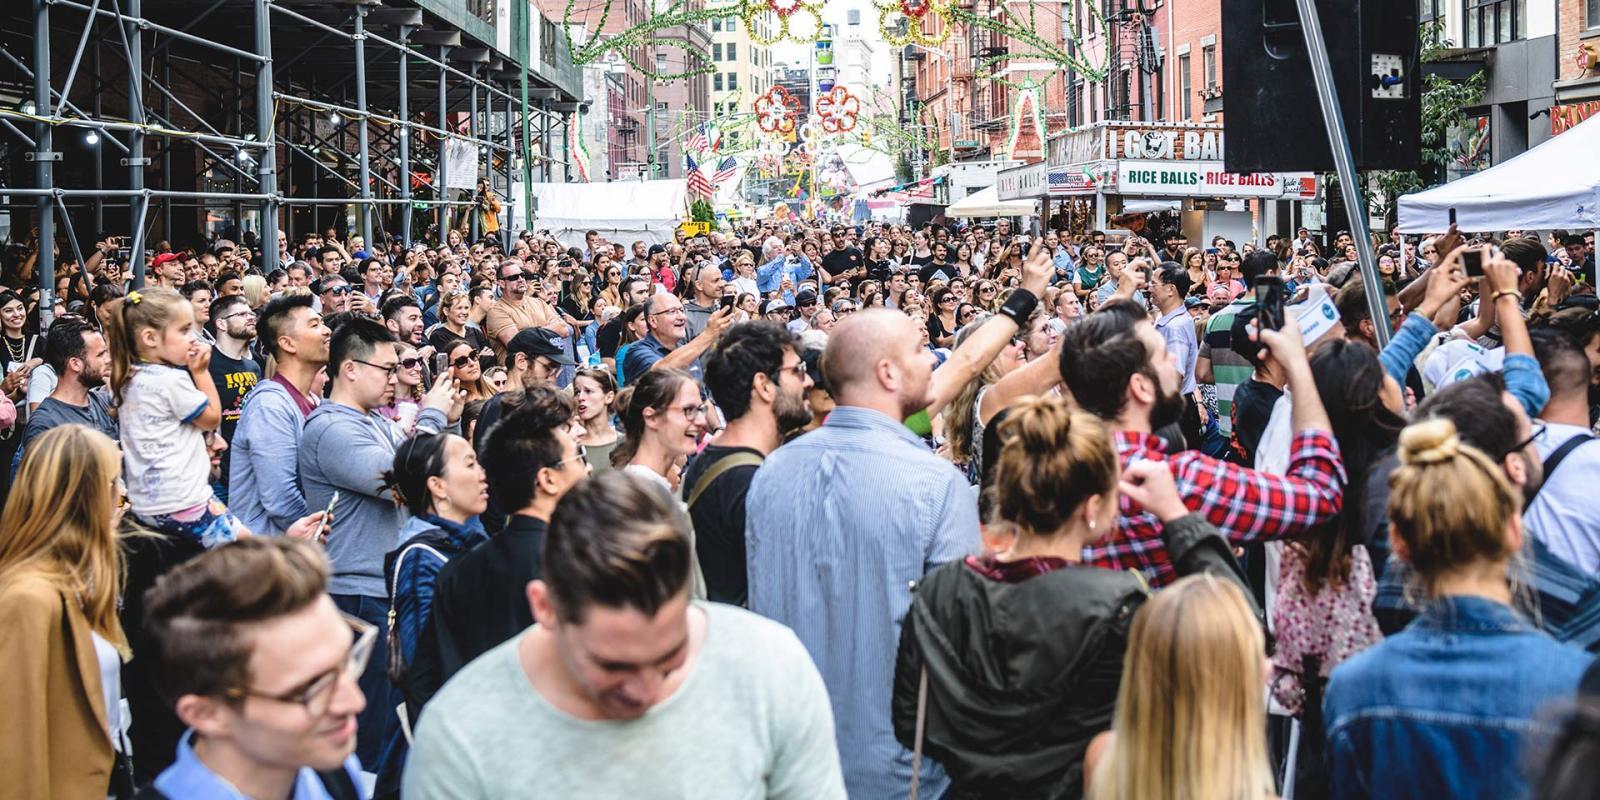 San Gennaro Festival New York 2020.The Feast Of San Gennaro In Little Italy 2020 All